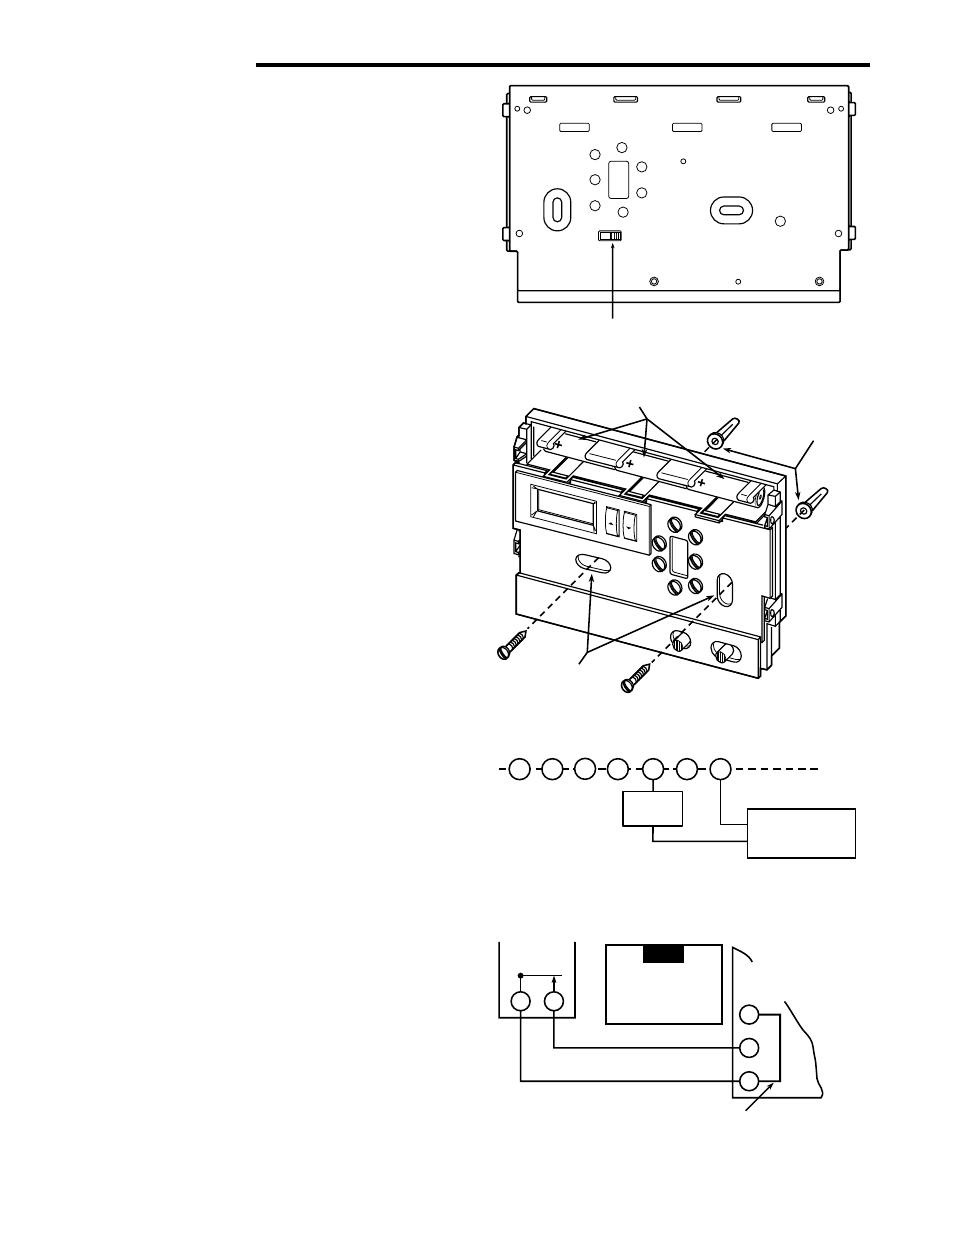 White Rodgers 1361 Zone Valve Wiring Diagram